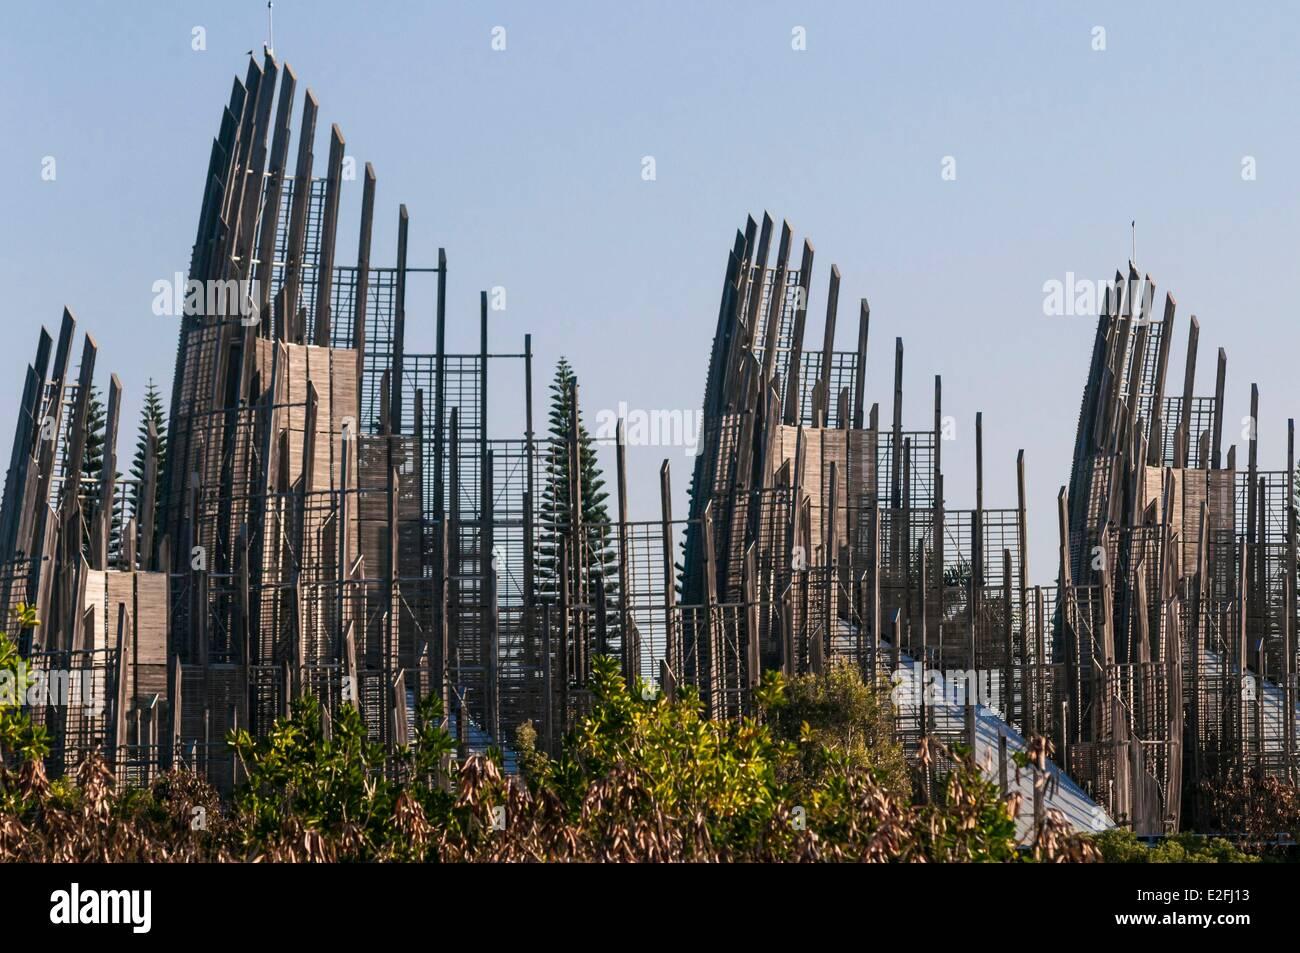 Francia, Nuova Caledonia, Grande Terre, Noumea, quartiere Magenta, Jean Marie Djibaou Kanak centro culturale da Immagini Stock